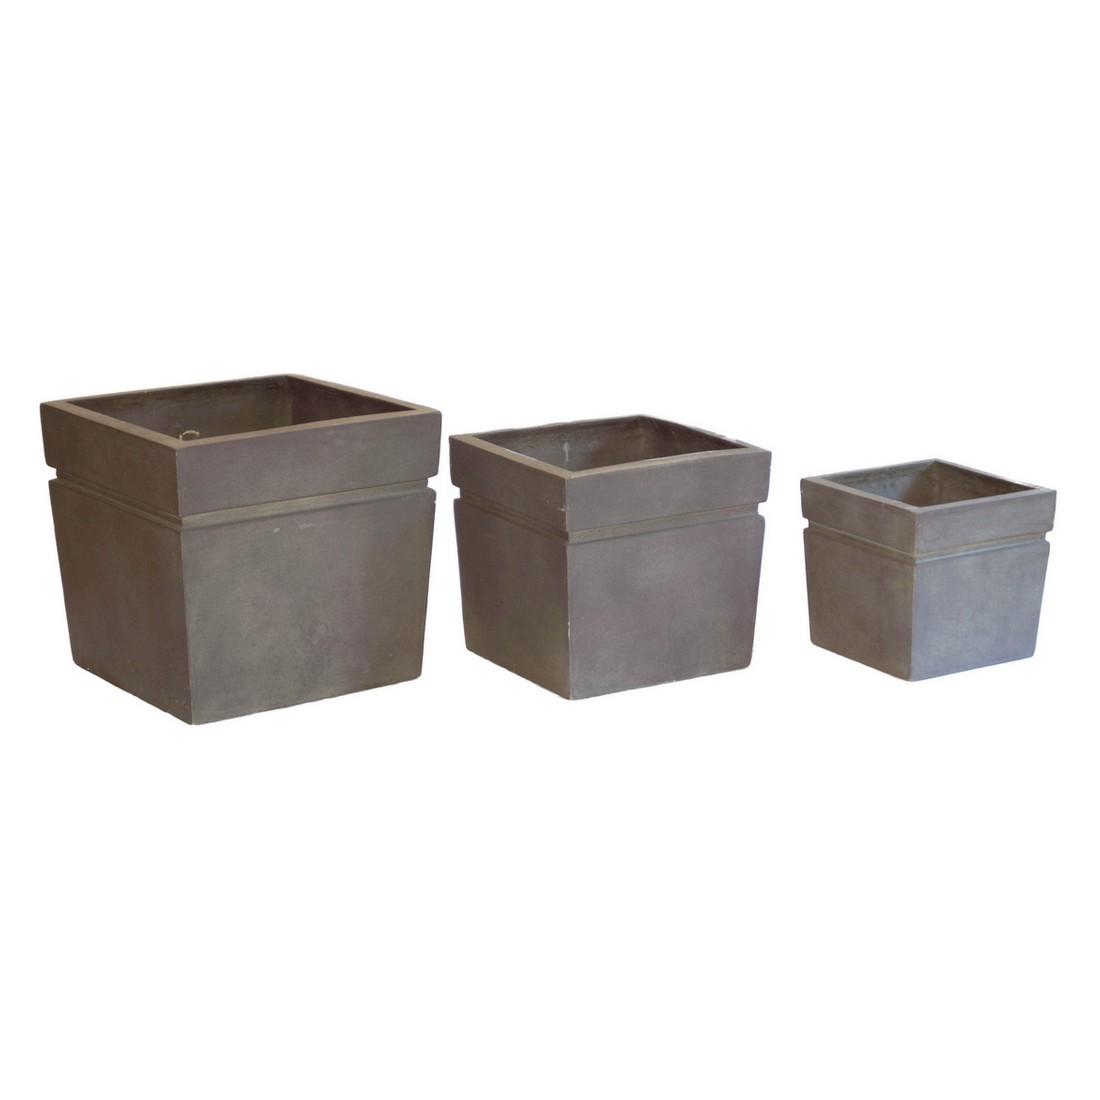 pflanzk bel cappuccino kunststoff modern eckig mittel h he 51 cm breit 55 cm einzeln. Black Bedroom Furniture Sets. Home Design Ideas